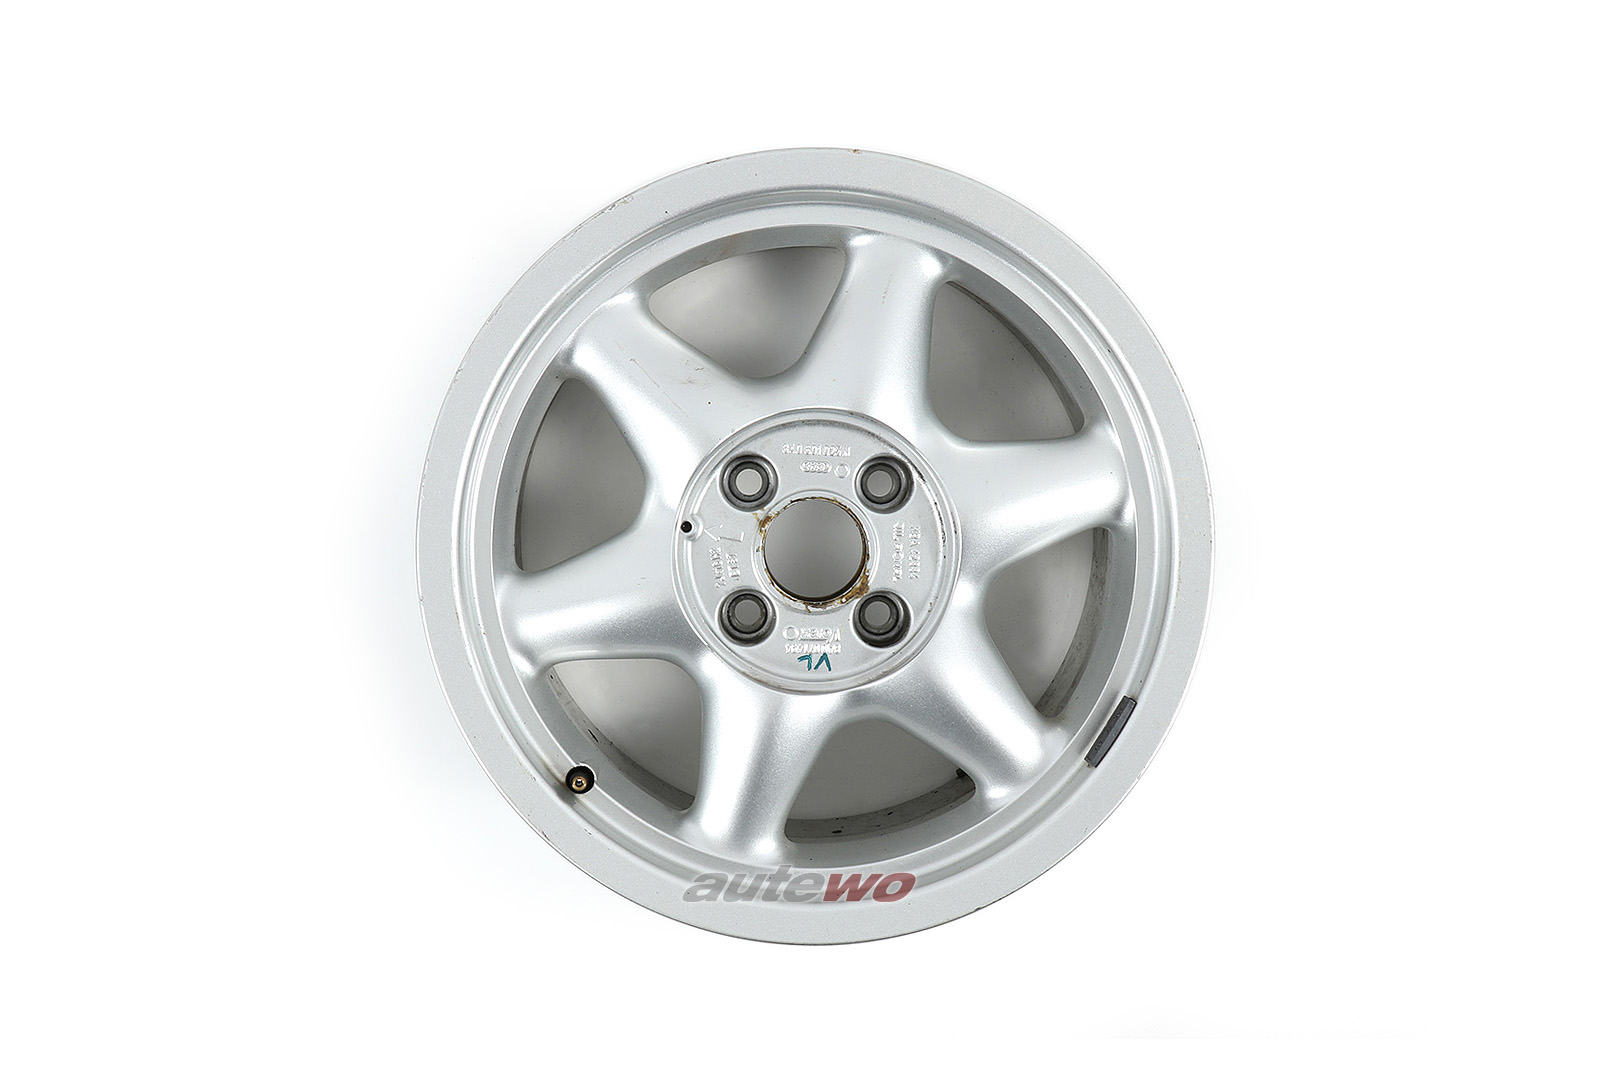 8A0601025N Audi 80 B4 16V Competition 6-Speichen-Felge 7x16 ET37 4x108